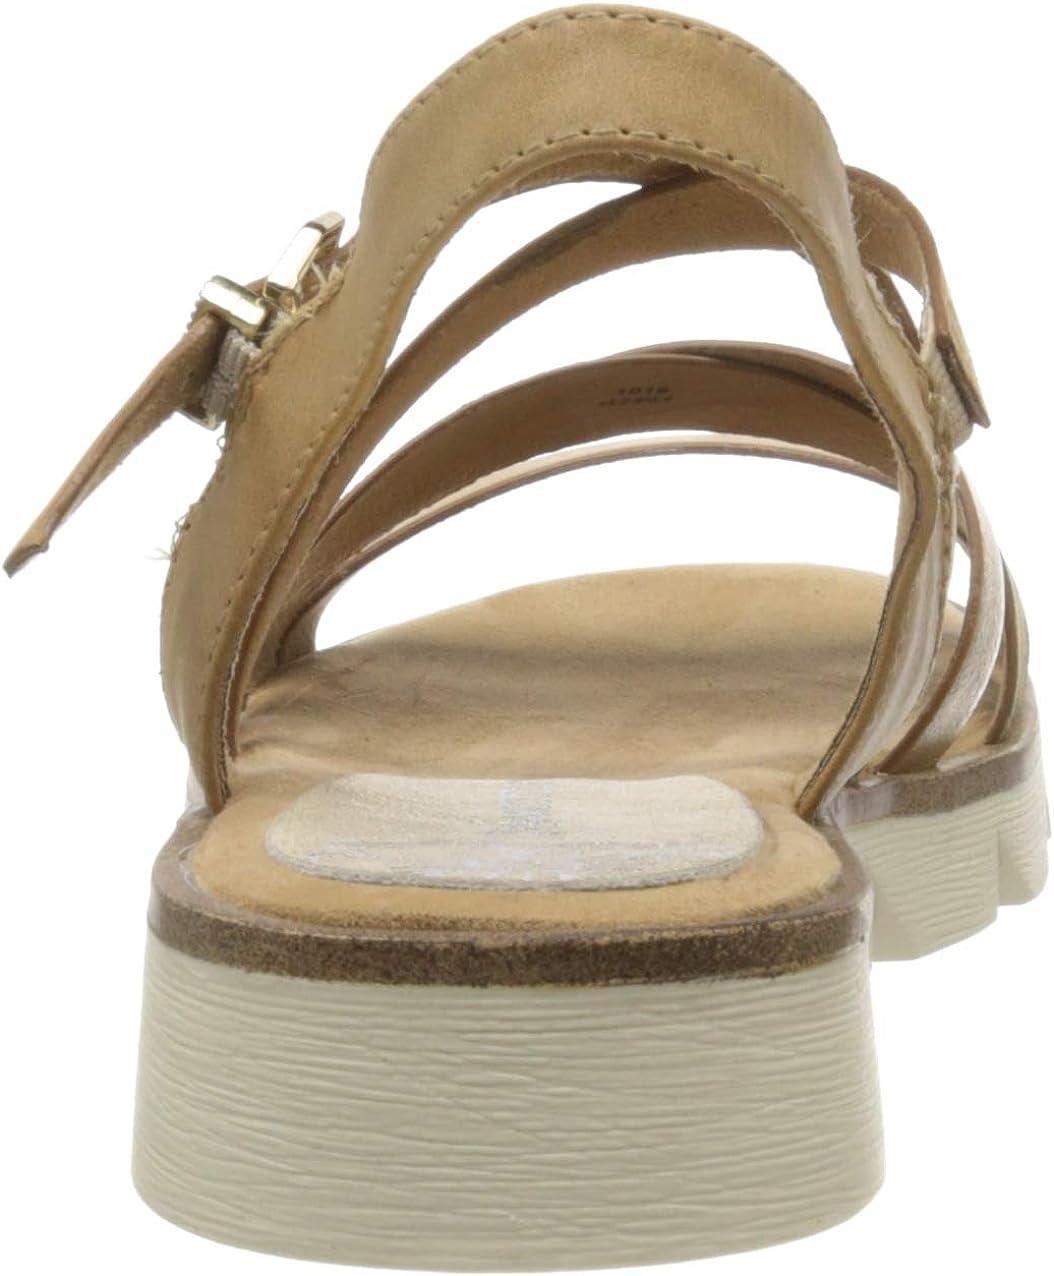 MARCO TOZZI 2-2-28608-24 Sandalia con Pulsera para Mujer